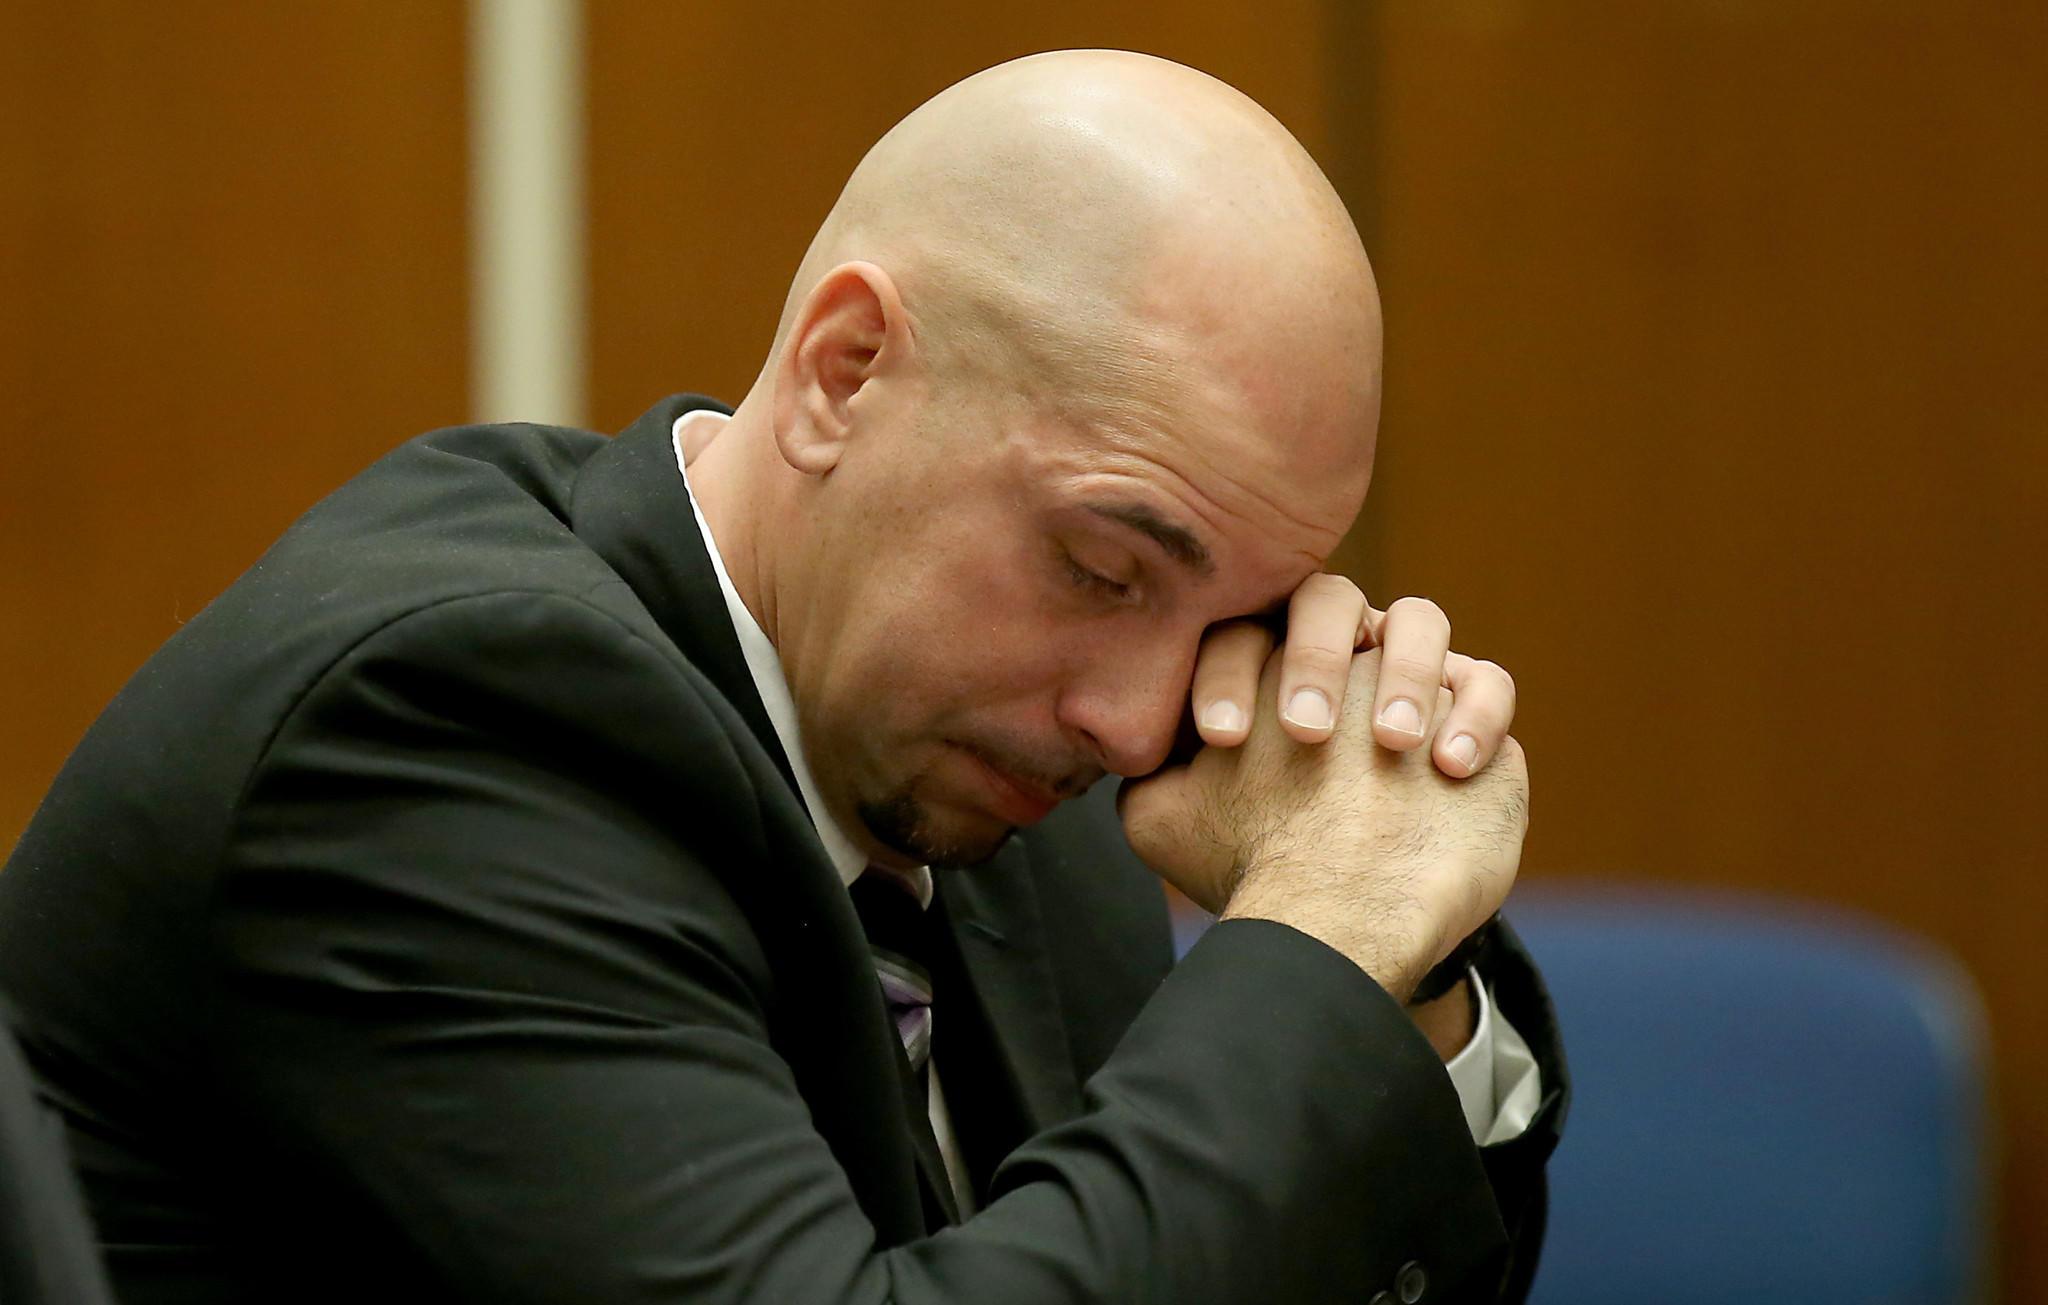 Revealed: How an ex-FBI profiler helped put an innocent man behind bars